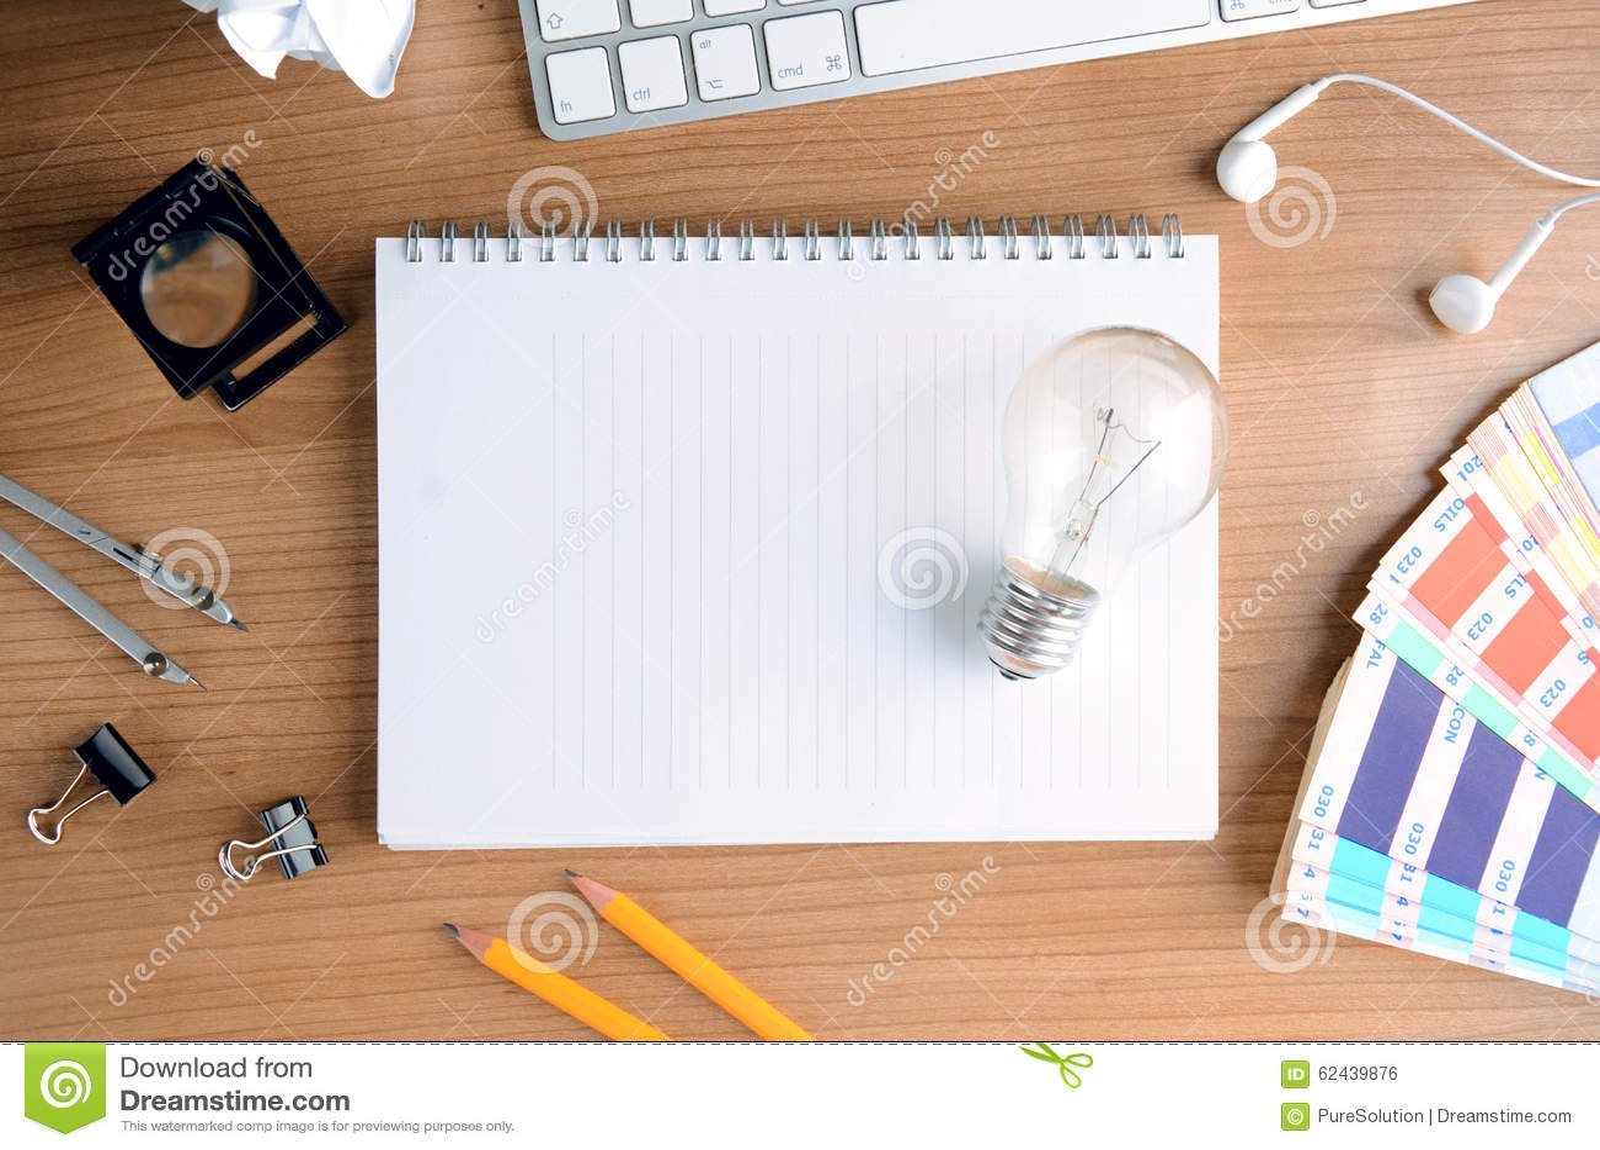 Top view of wooden desktop with design equipment stock for Top view design